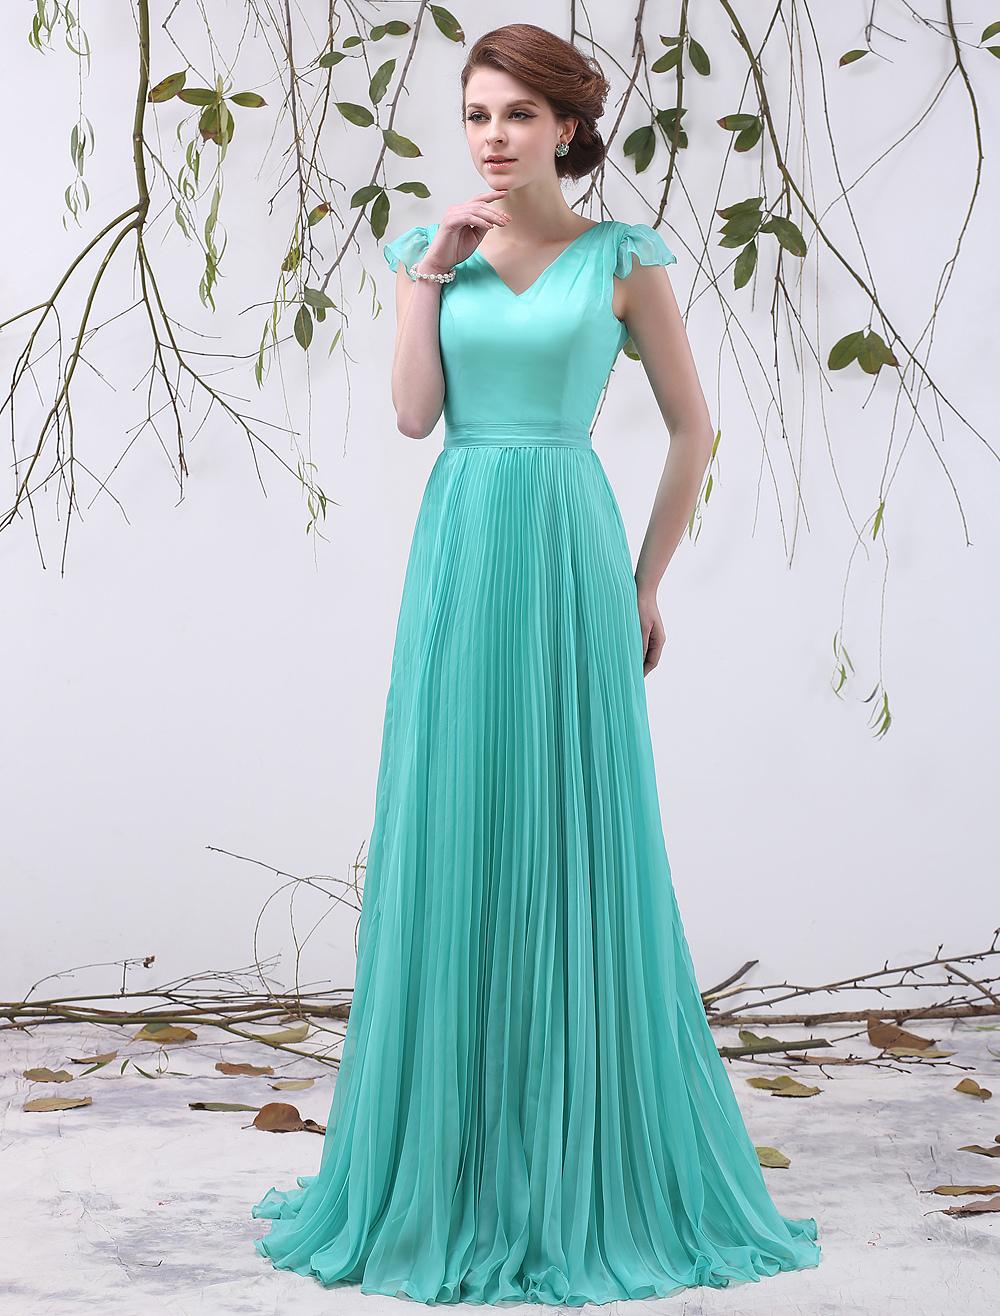 Chiffon Bridesmaid Dress Turquoise V Neck Prom Dress A Line Pleated Floor Length Party Dress Milanoo